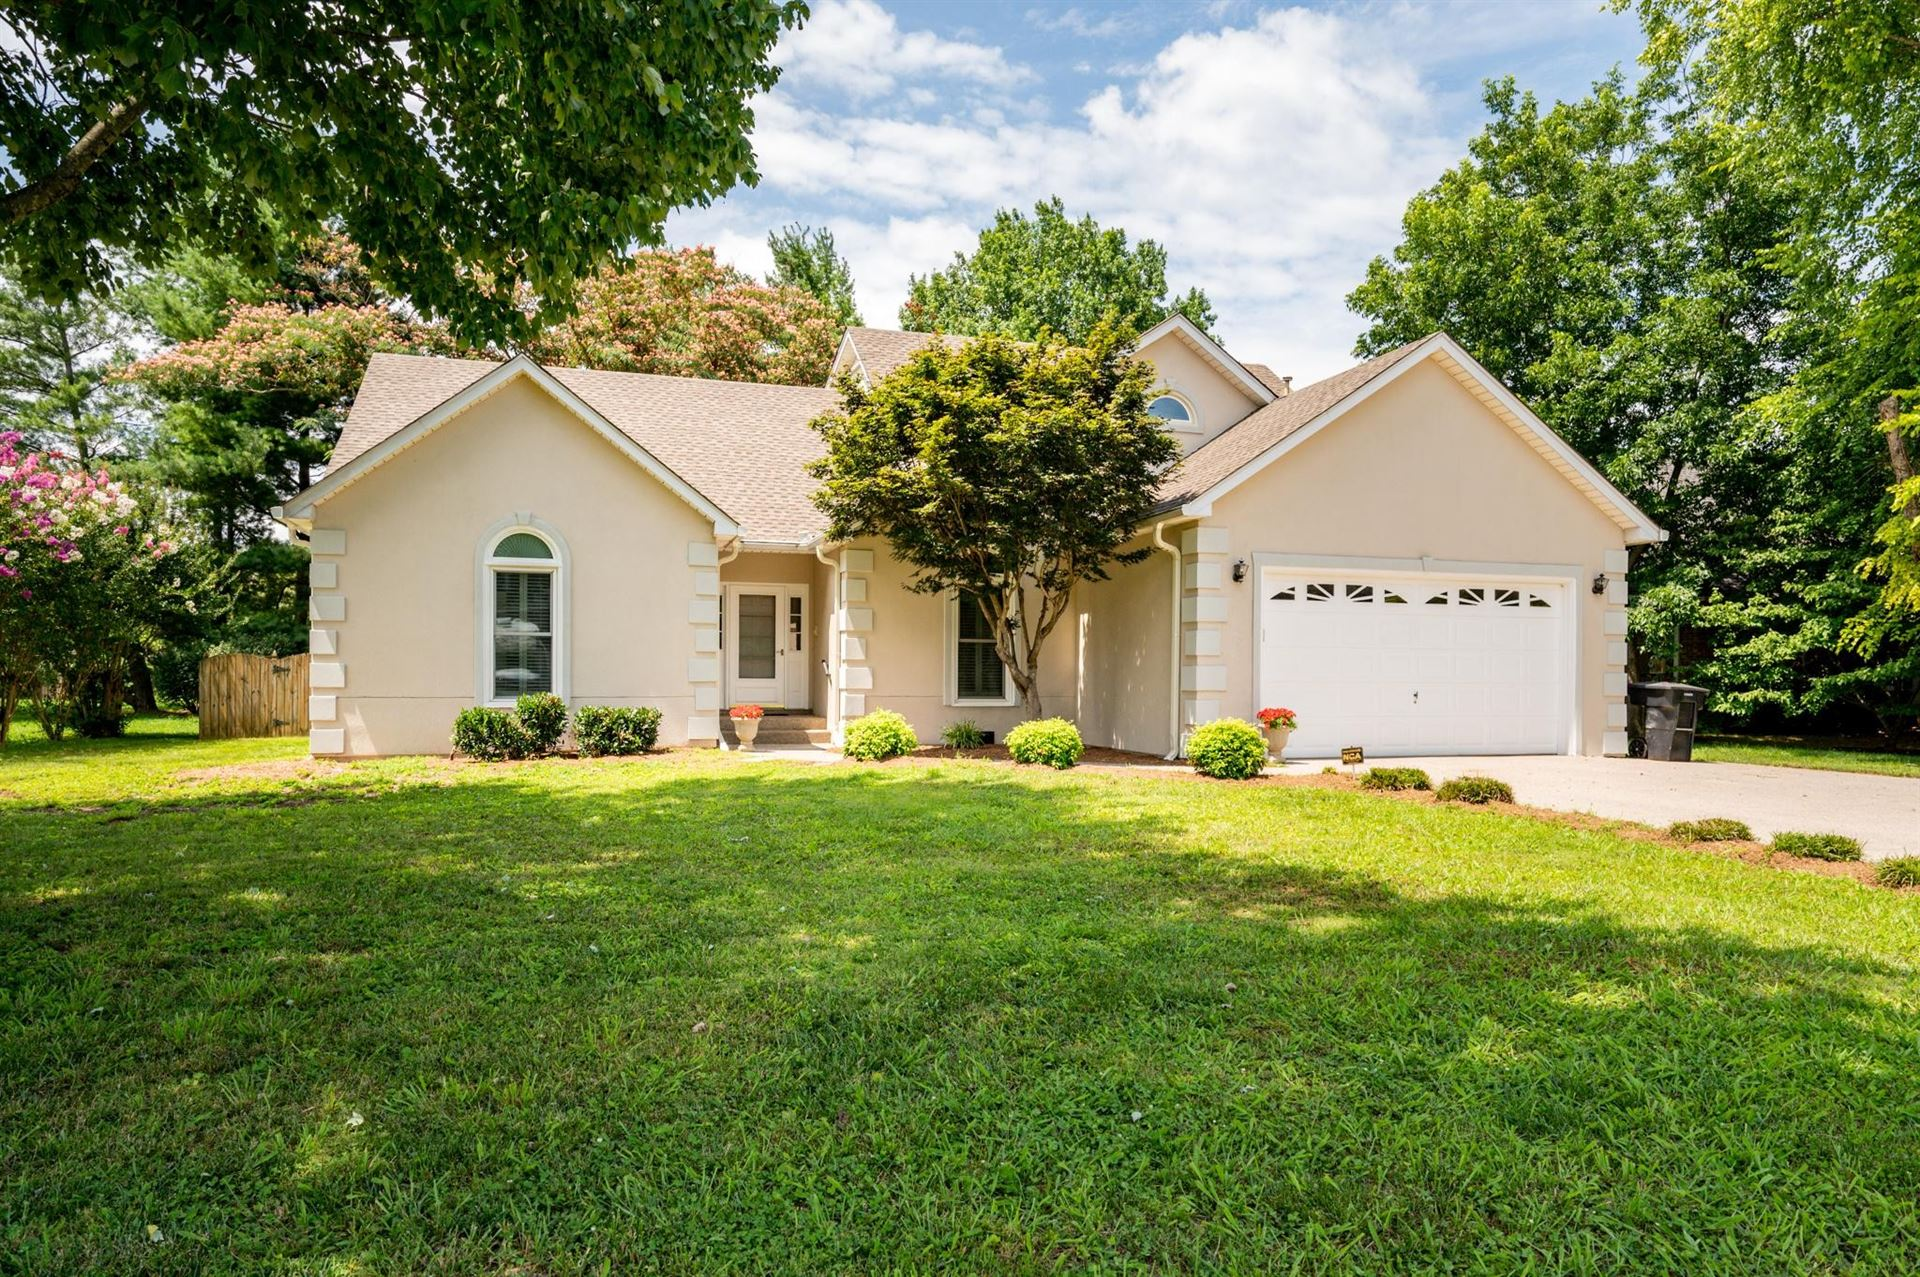 1407 Canterbury Lane, Murfreesboro, TN 37130 - MLS#: 2274733